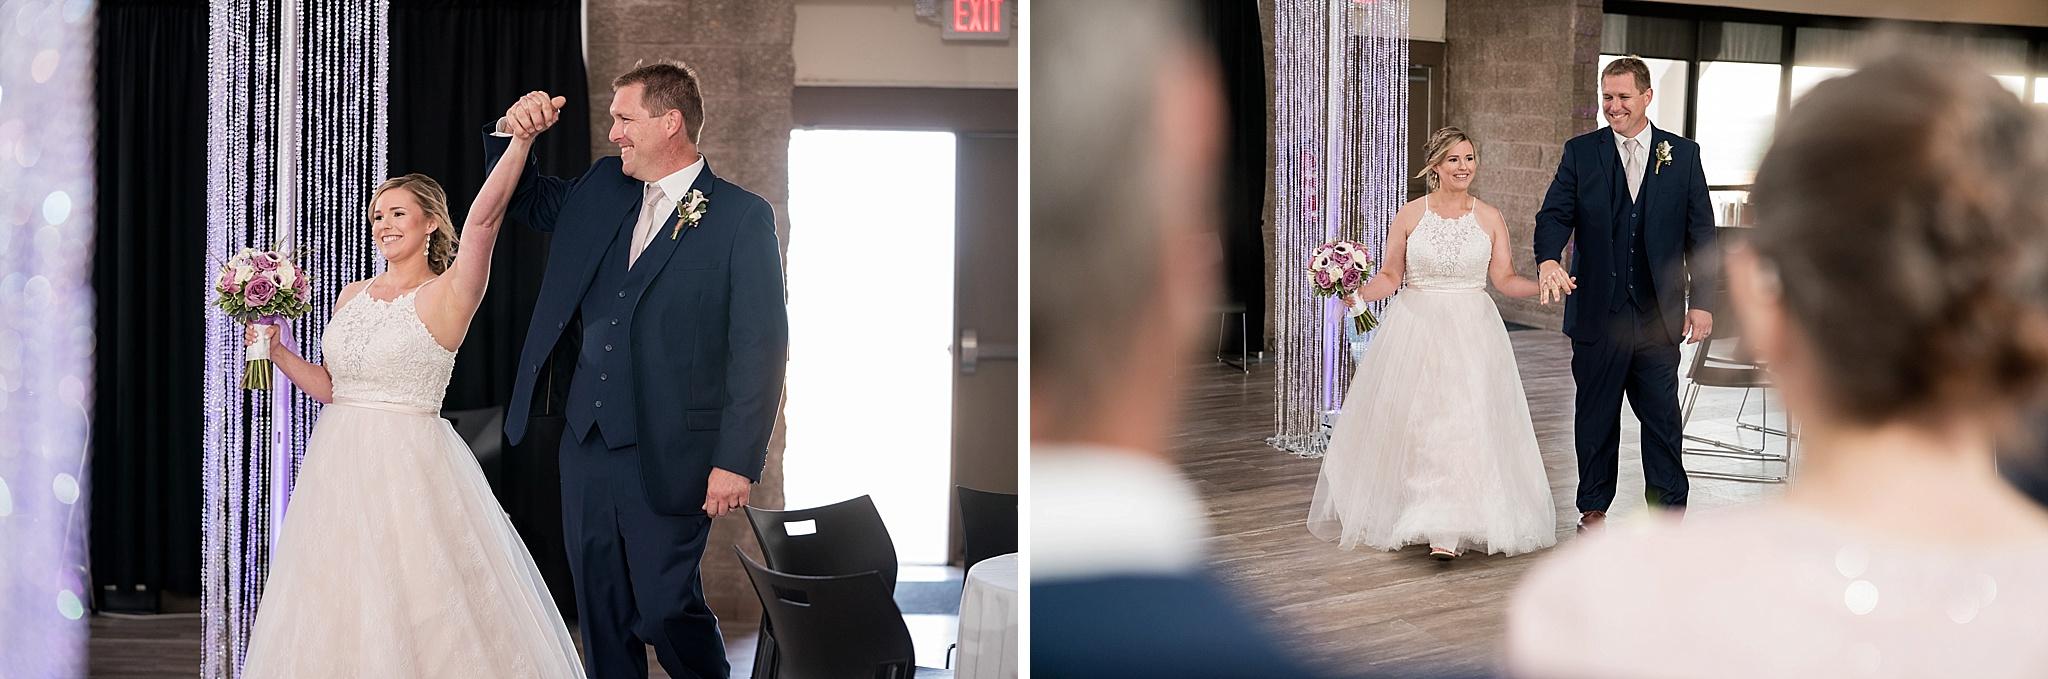 Crystal-Coast-Wedding-Photographer-041.jpg